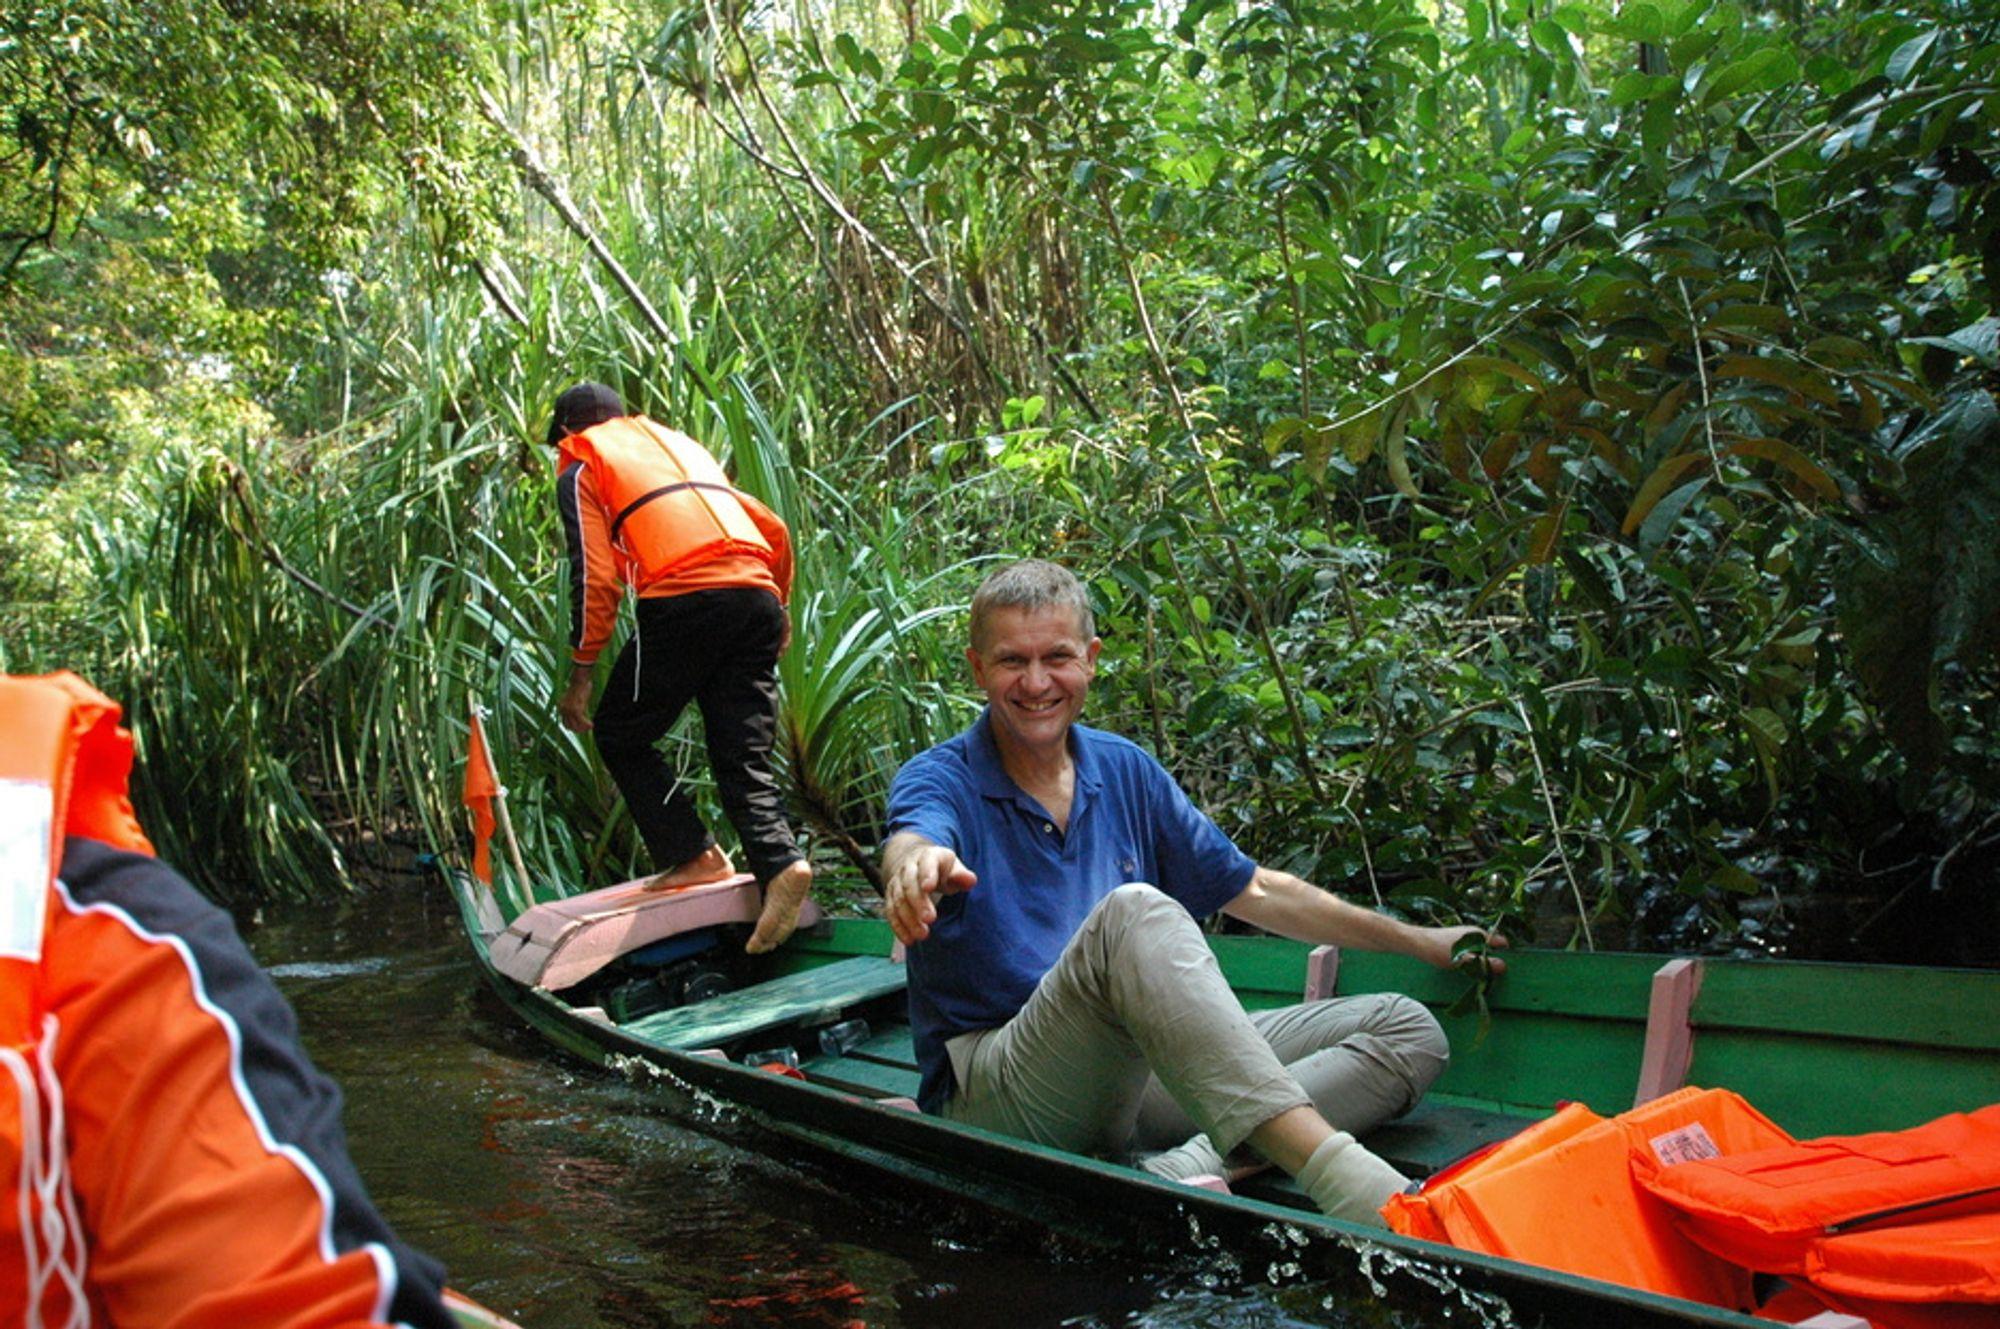 Det hjelper miljøvernminister Erik Solheim lite at han og regjeringen deler ut milliarder på kanotur i regnskogen. Norge kommer langt ned på en ny klimarankingen.